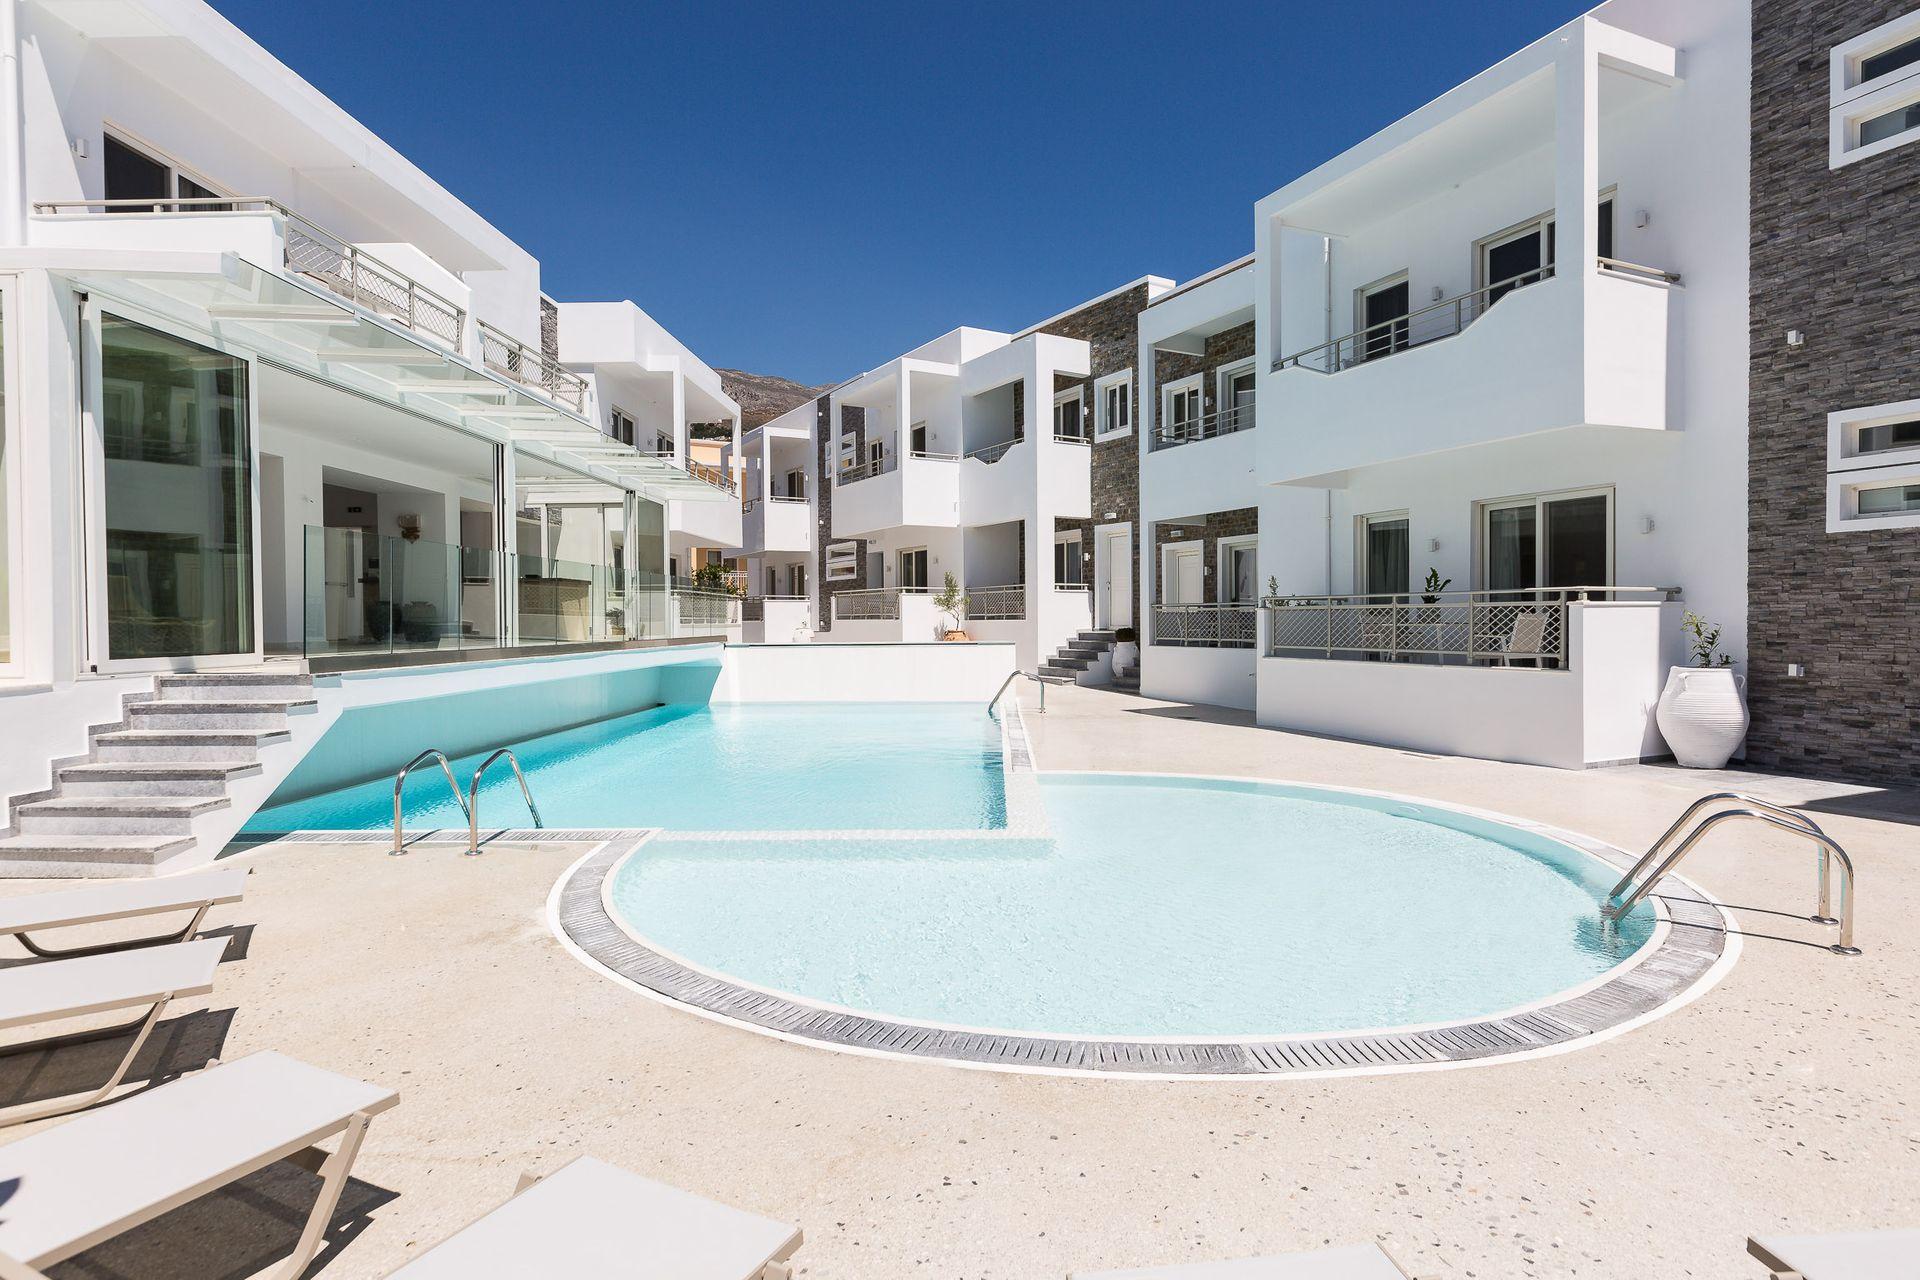 4* Cyano Hotel Plakias - Ρέθυμνο, Κρήτη ✦ 4 Ημέρες (3 Διανυκτερεύσεις) ✦ 2 άτομα + 1 παιδί έως 6 ετών ✦ Πρωινό ✦ 01/09/2021 έως 30/09/2021 ✦ Κοντά σε παραλία!